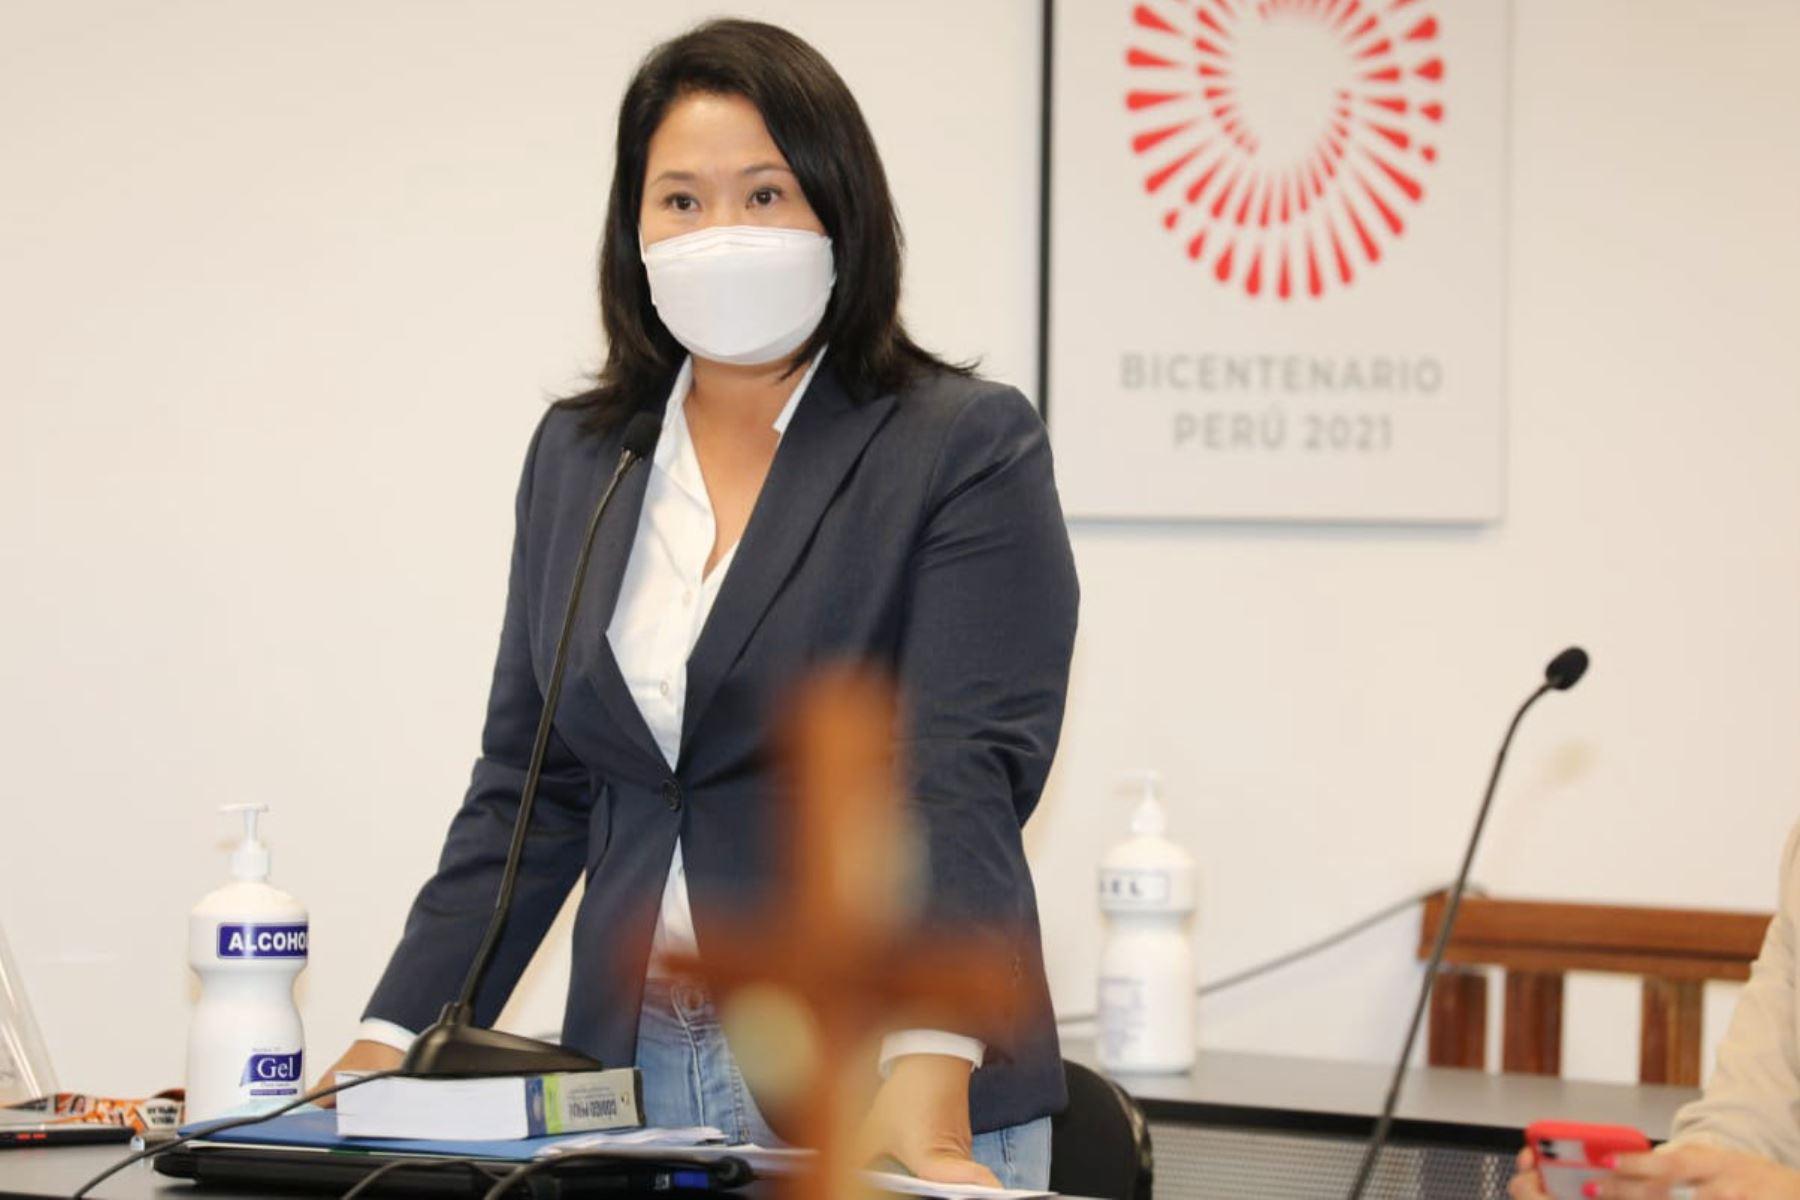 Fiscalía abre nueva investigación a Keiko Fujimori por audios de Montesinos